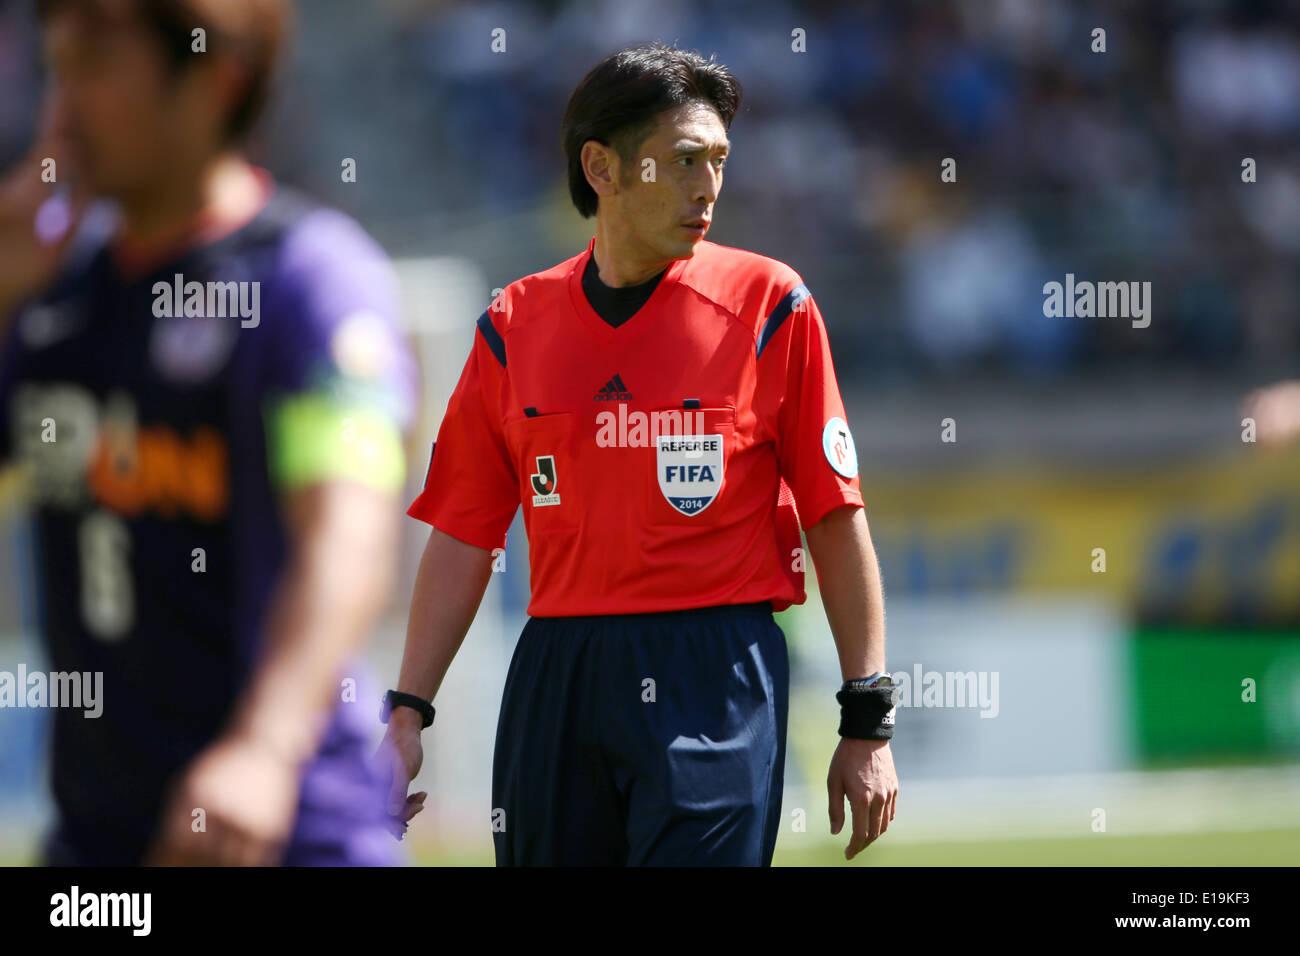 Yuichi Nishimura, MAY18, 2014 - Football/Soccer : 2014 J.League Division 1, between Vegalta Sendai 1-0 Sanfrecce Hiroshima at Yurtec Stadium Sendai, Miyagi, Japan. © Jun Tsukida/AFLO SPORT/Alamy Live News - Stock Image